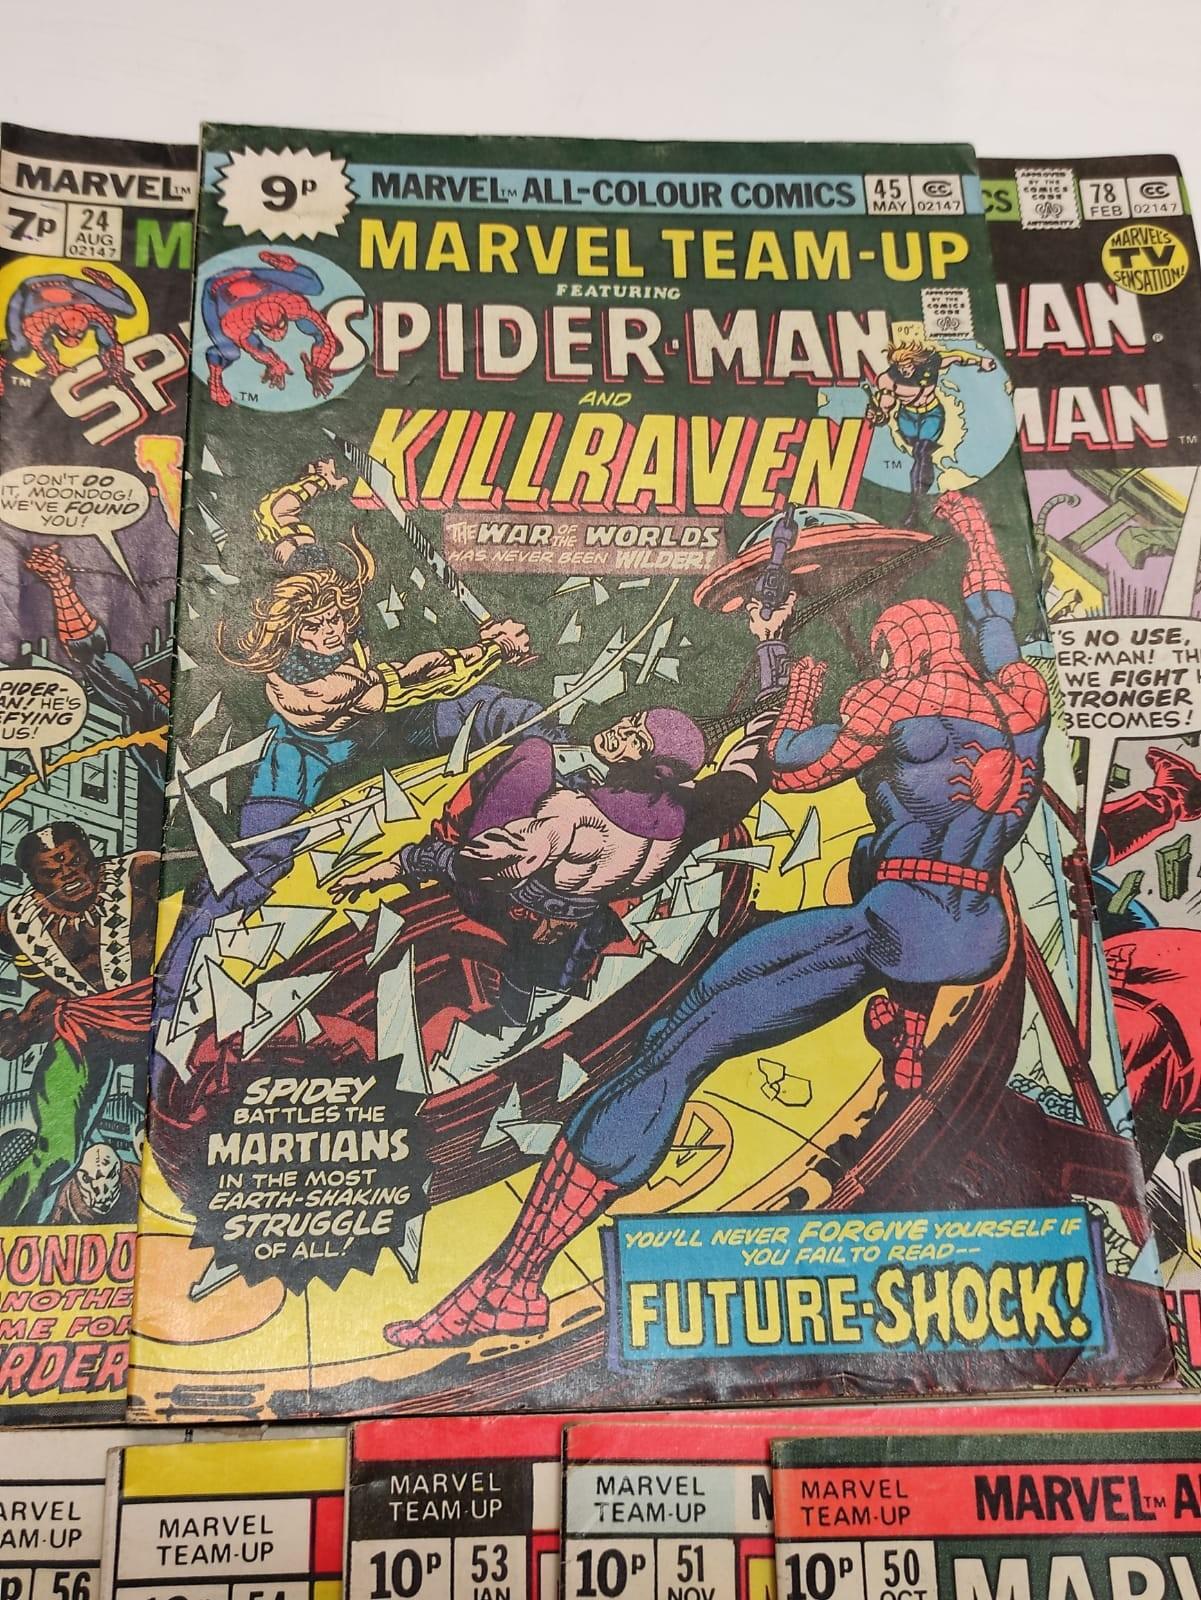 24 x Marvel comics. Marvel Team-Up featuring Spider-Man. 1977 - 1980. - Image 4 of 10